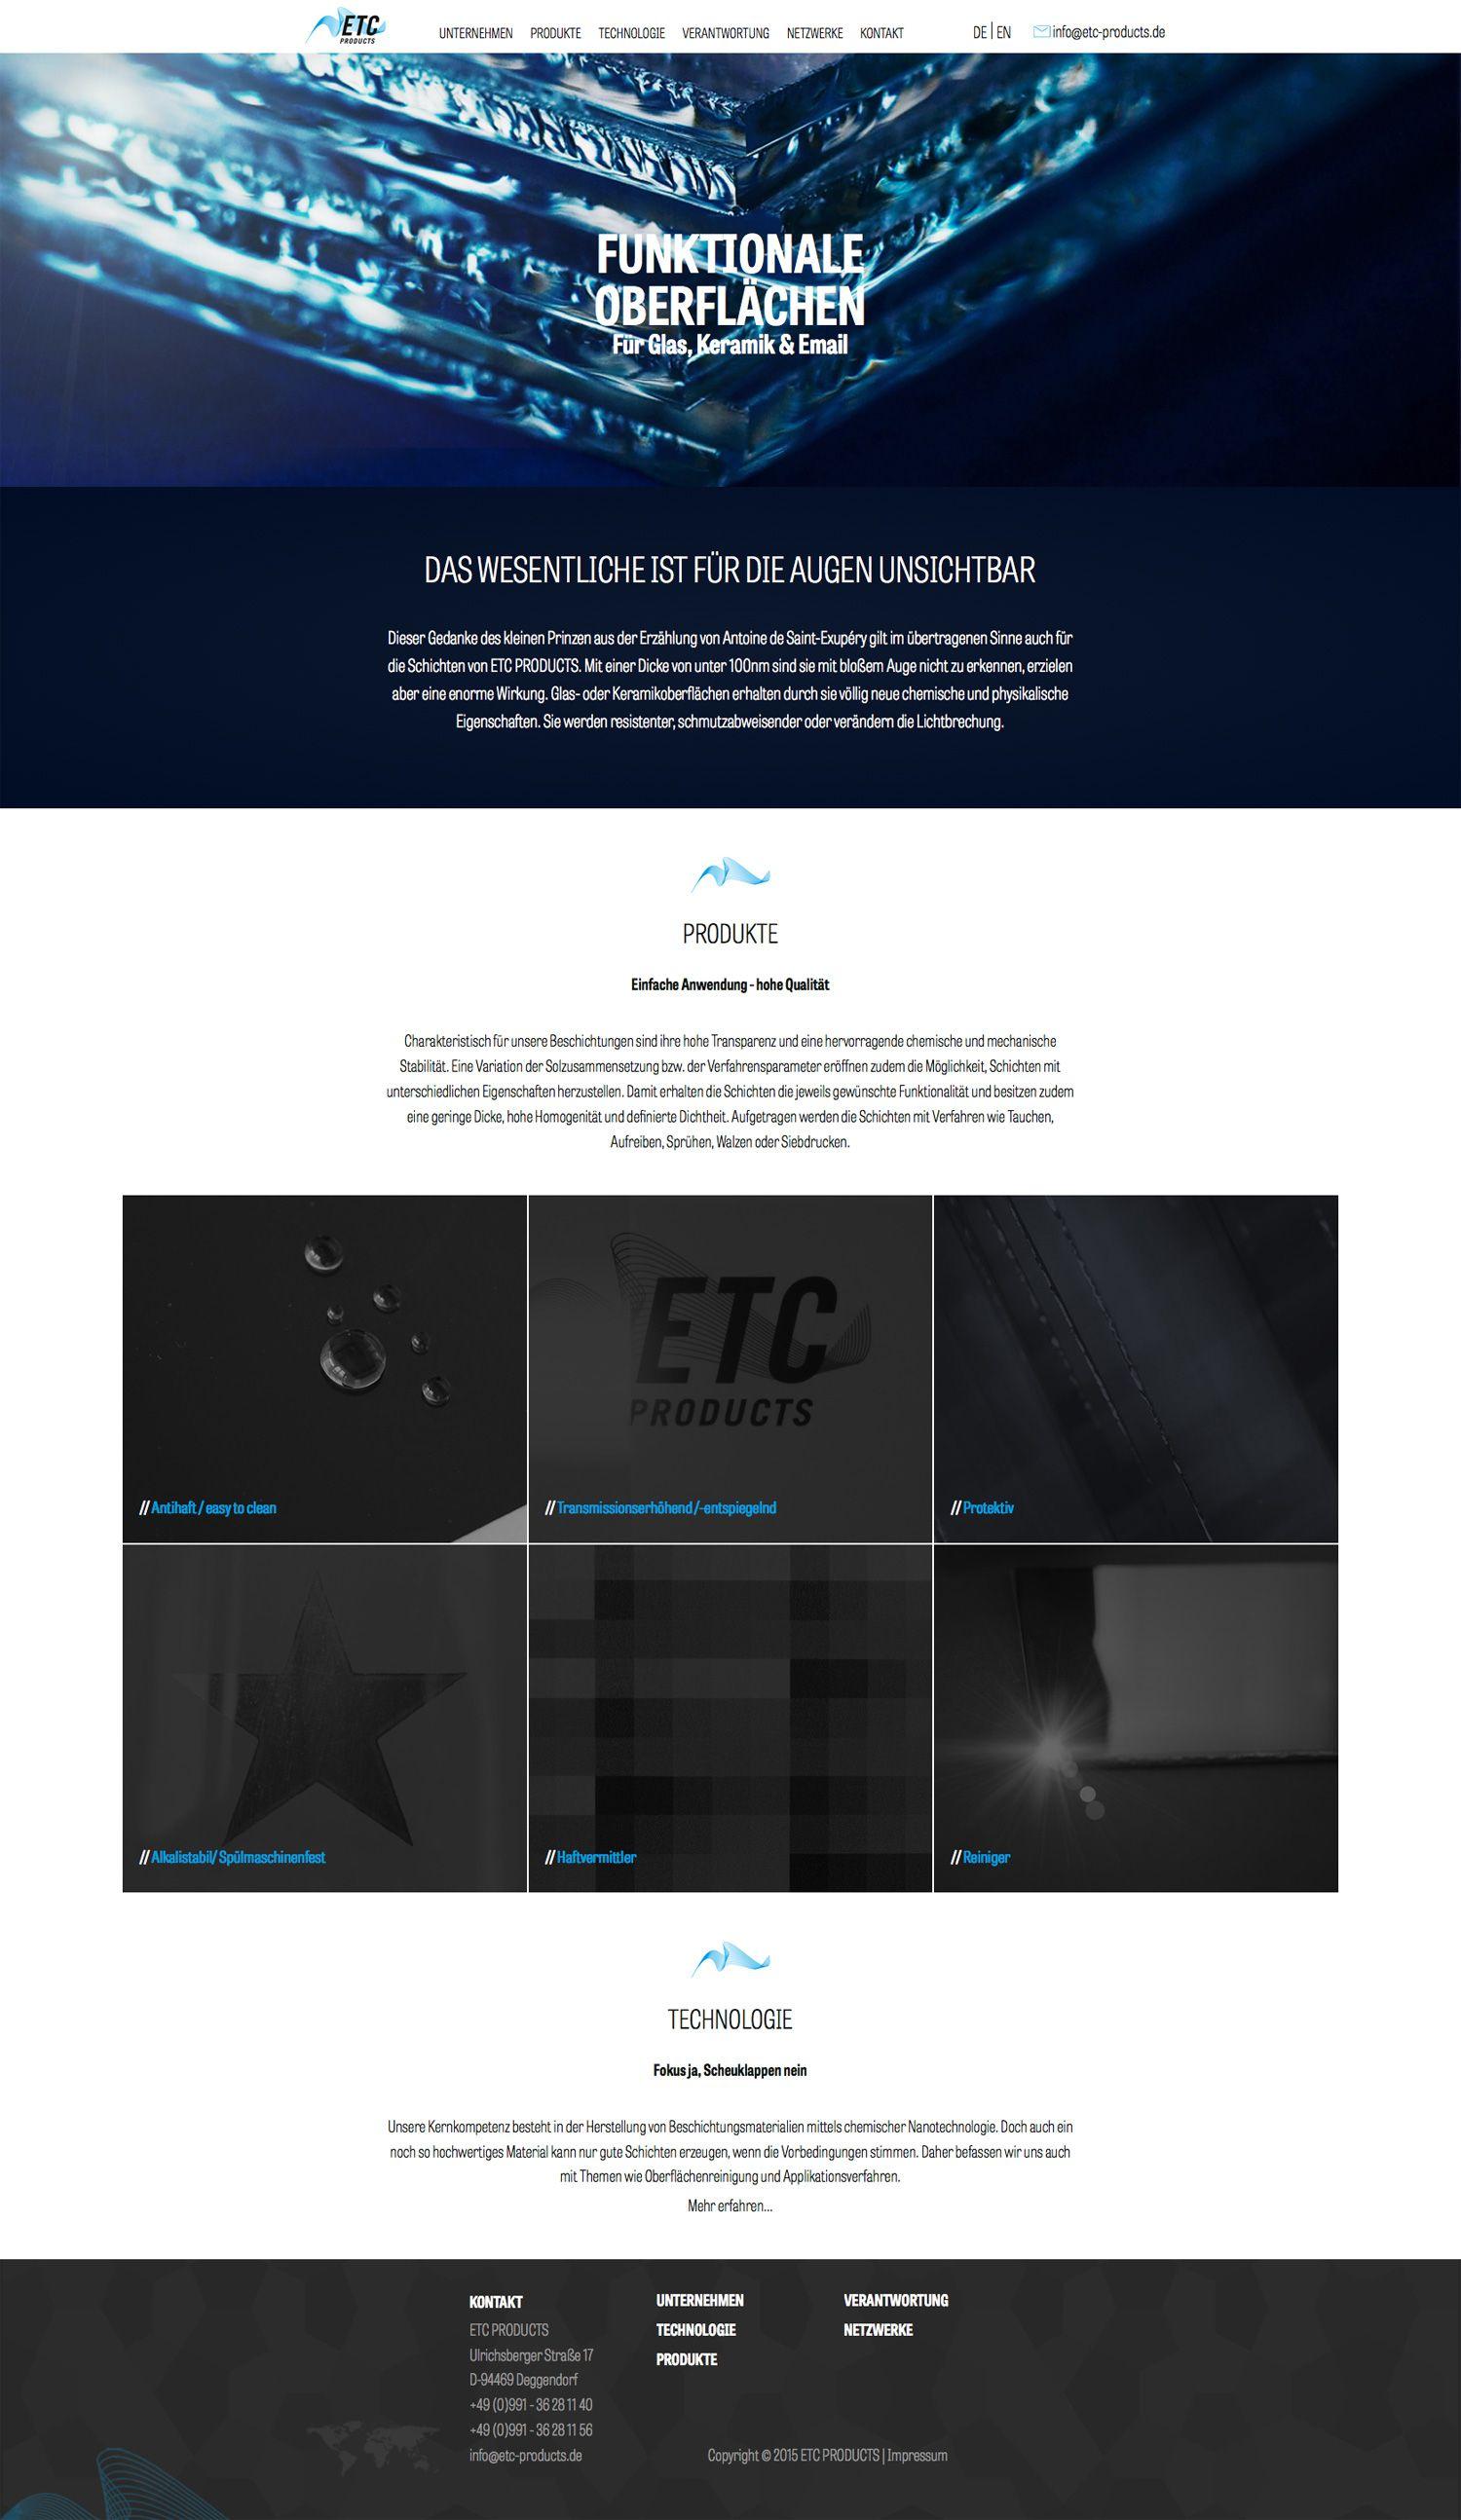 #etc #products #deggendorf #k1marketing #online #web #design #responsive